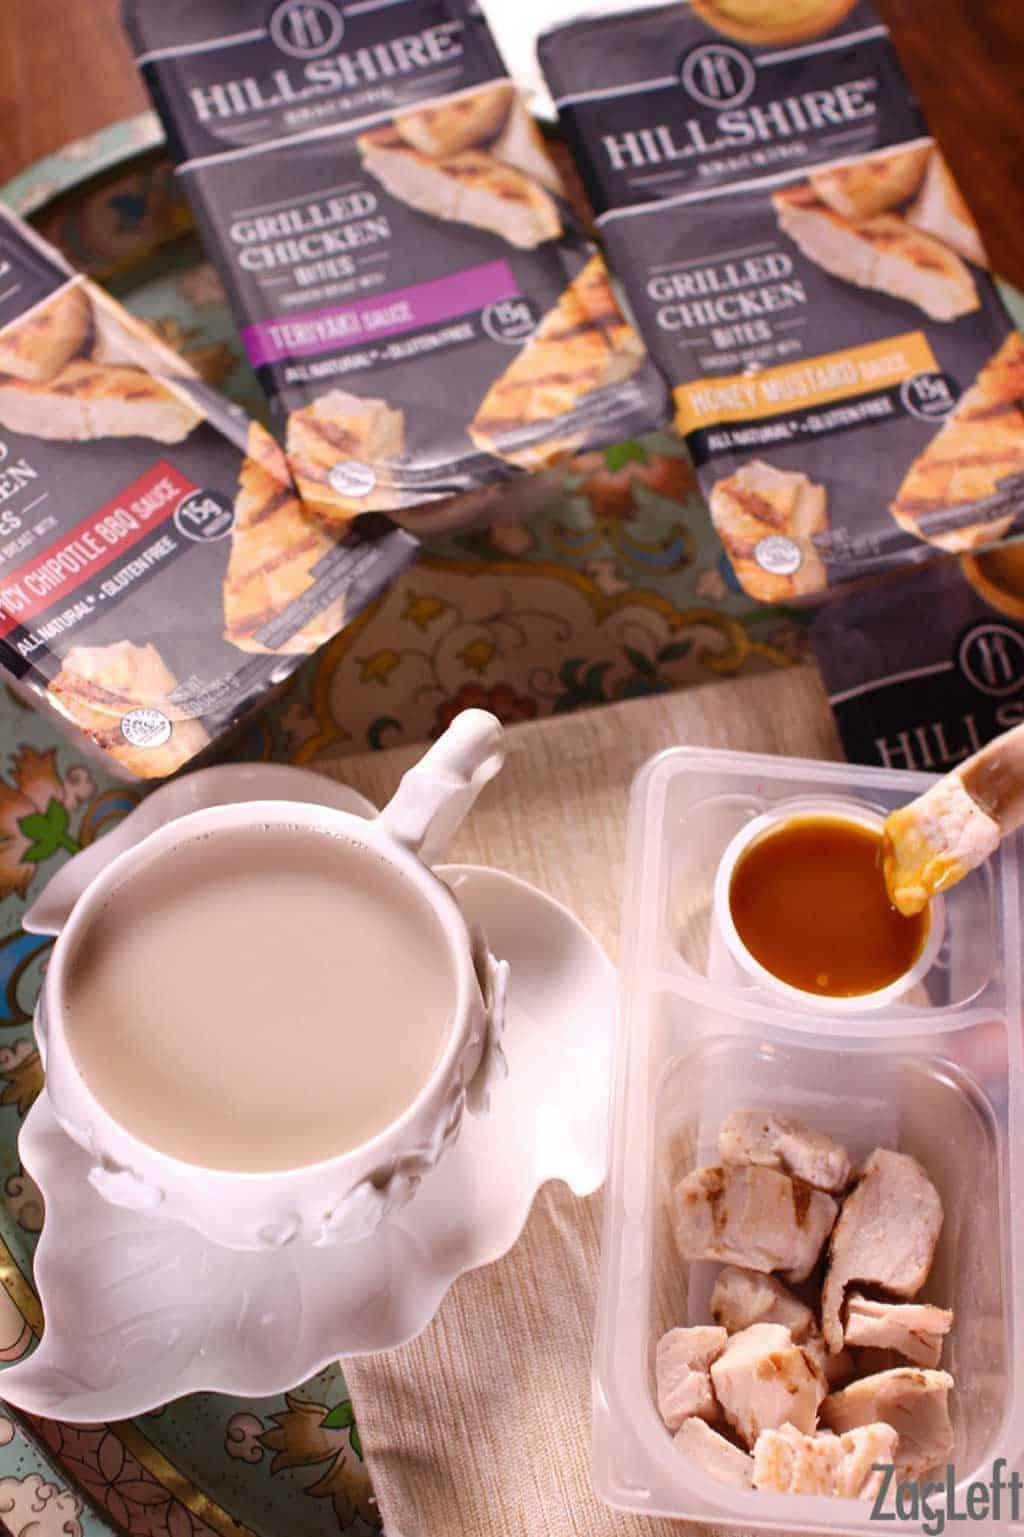 Cinnamon-Star Anise Tea Latte - Earl Grey tea infused with cinnamon and star anise and mixed with milk. Creamy, sweet and perfectly spiced. | www.zagleft.com